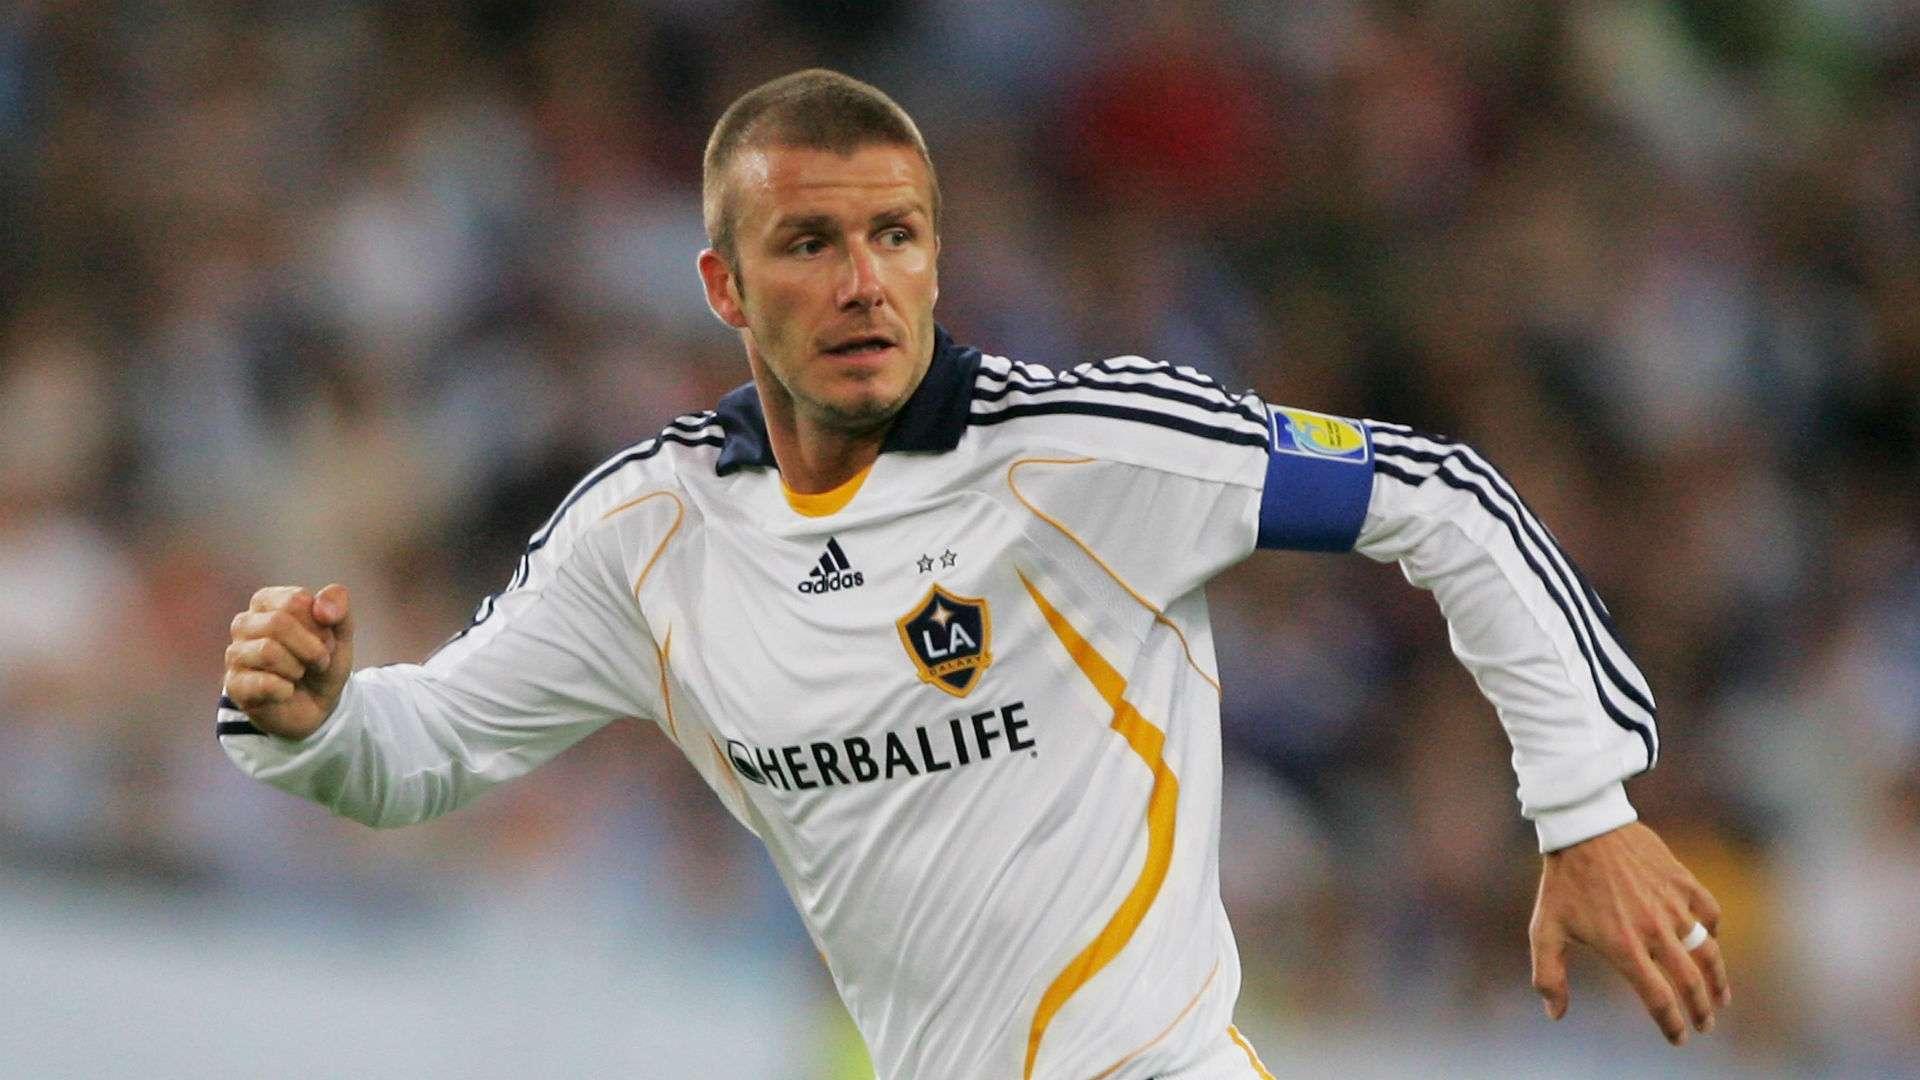 David Beckham s career - Man Utd icon bdfab25e1